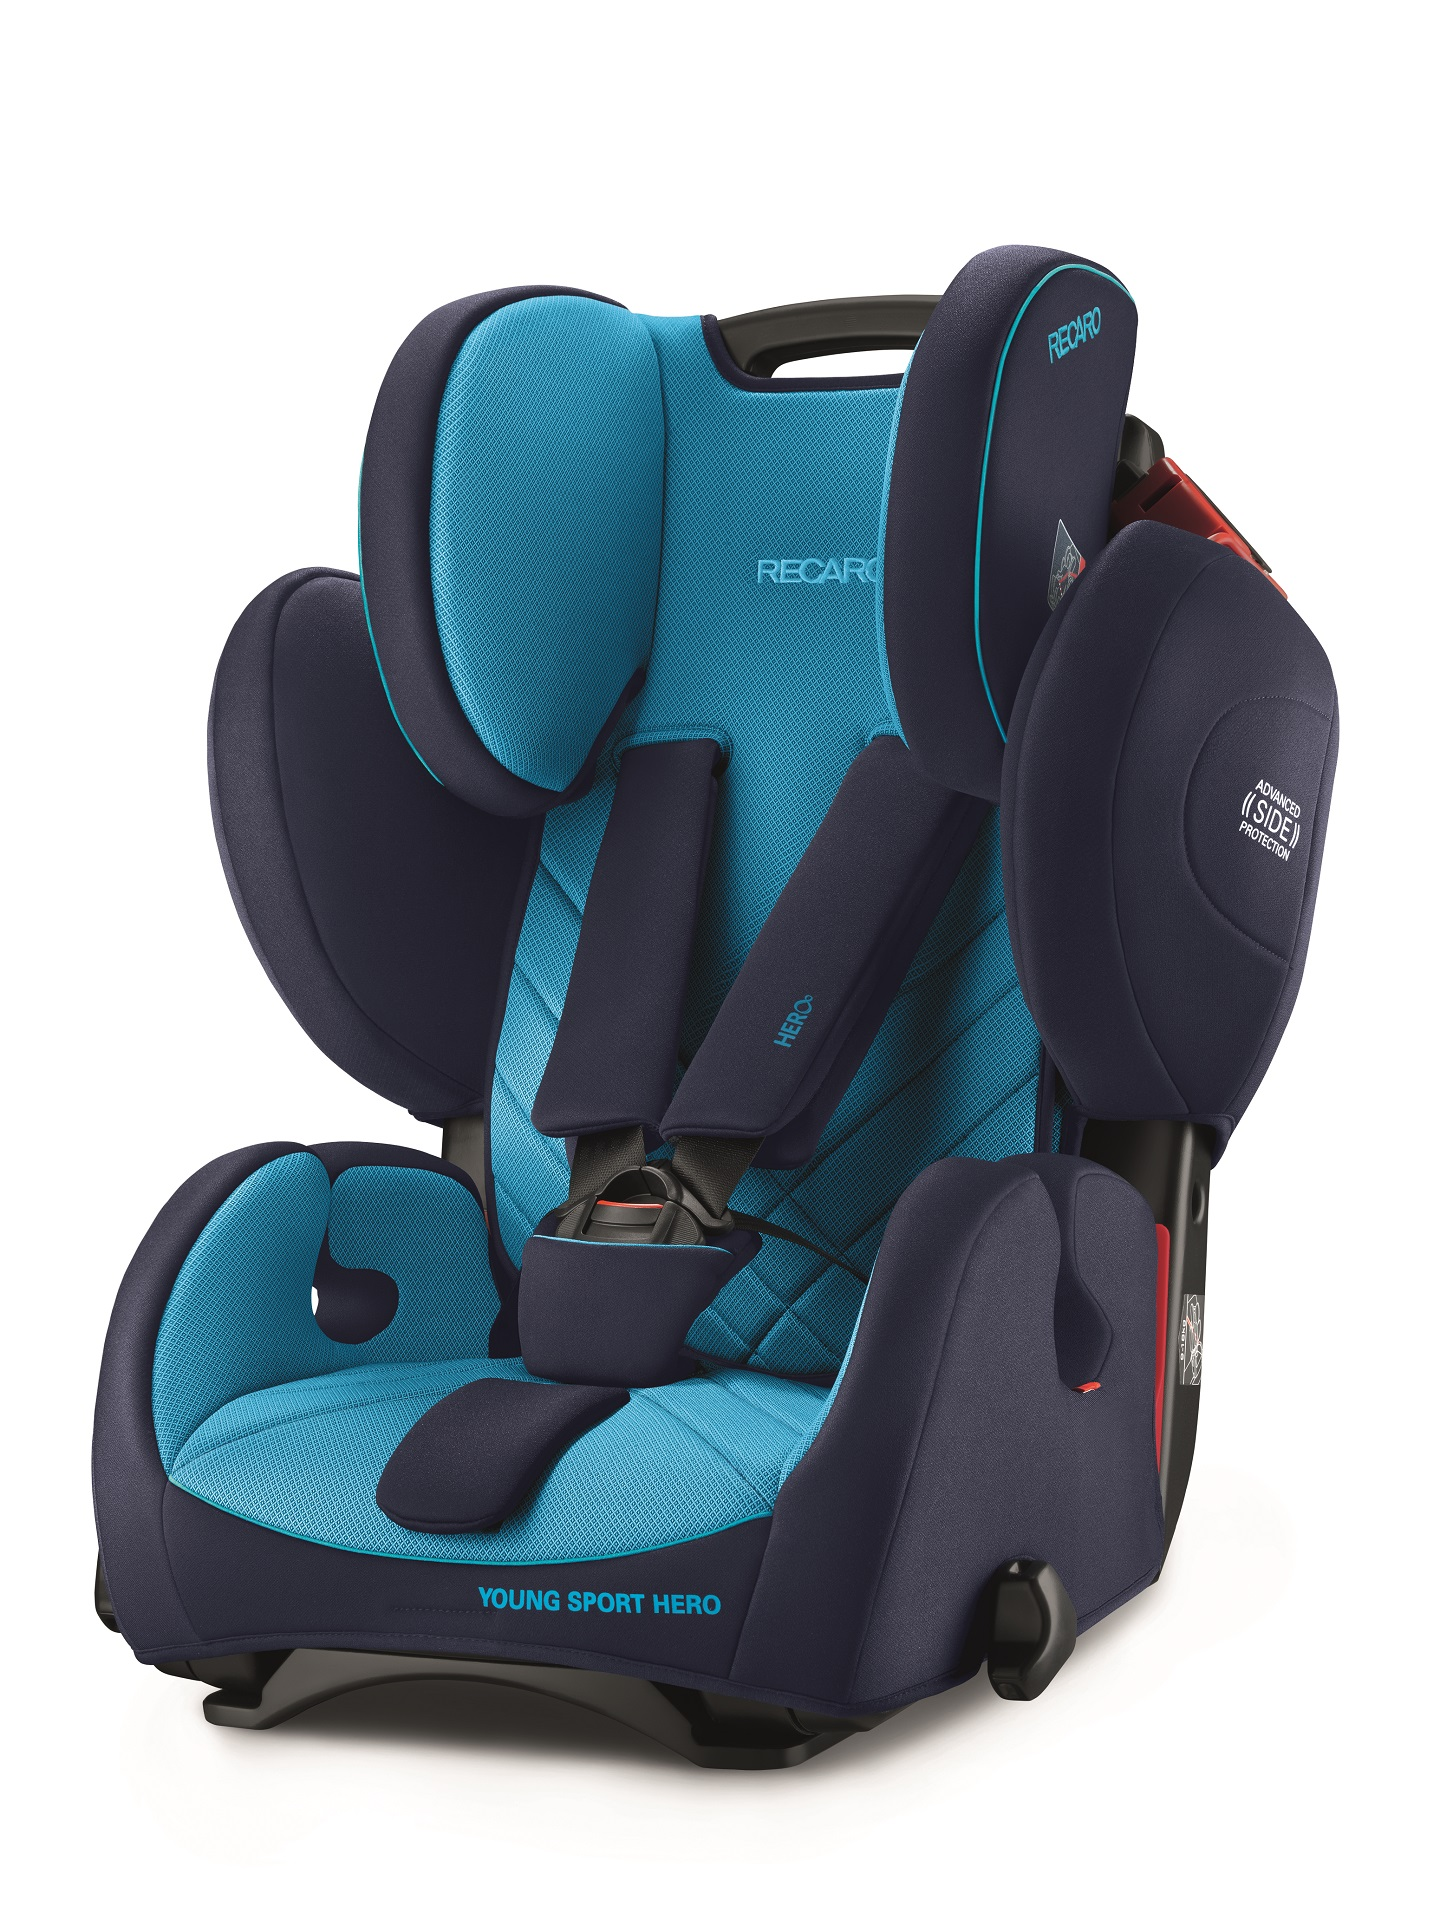 9b68cdc5e295 ... Recaro Child Car Seat Young Sport Hero Carbon Black 2019 - large image  2 ...